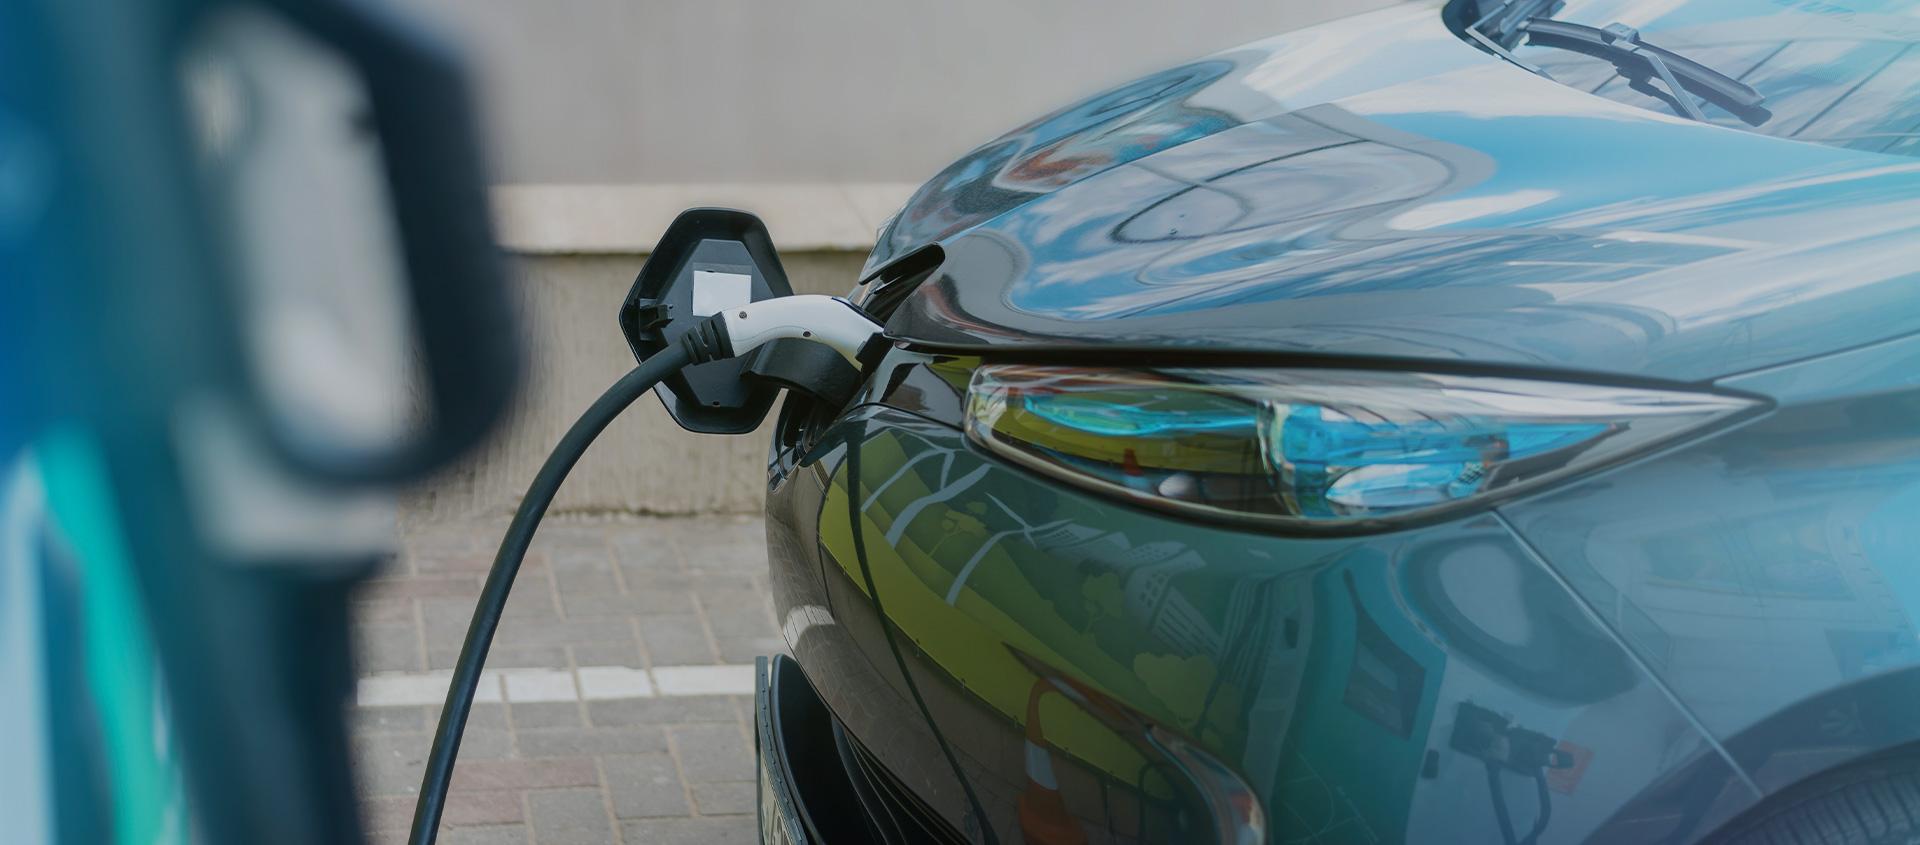 Punto de carga para vehículos eléctricos